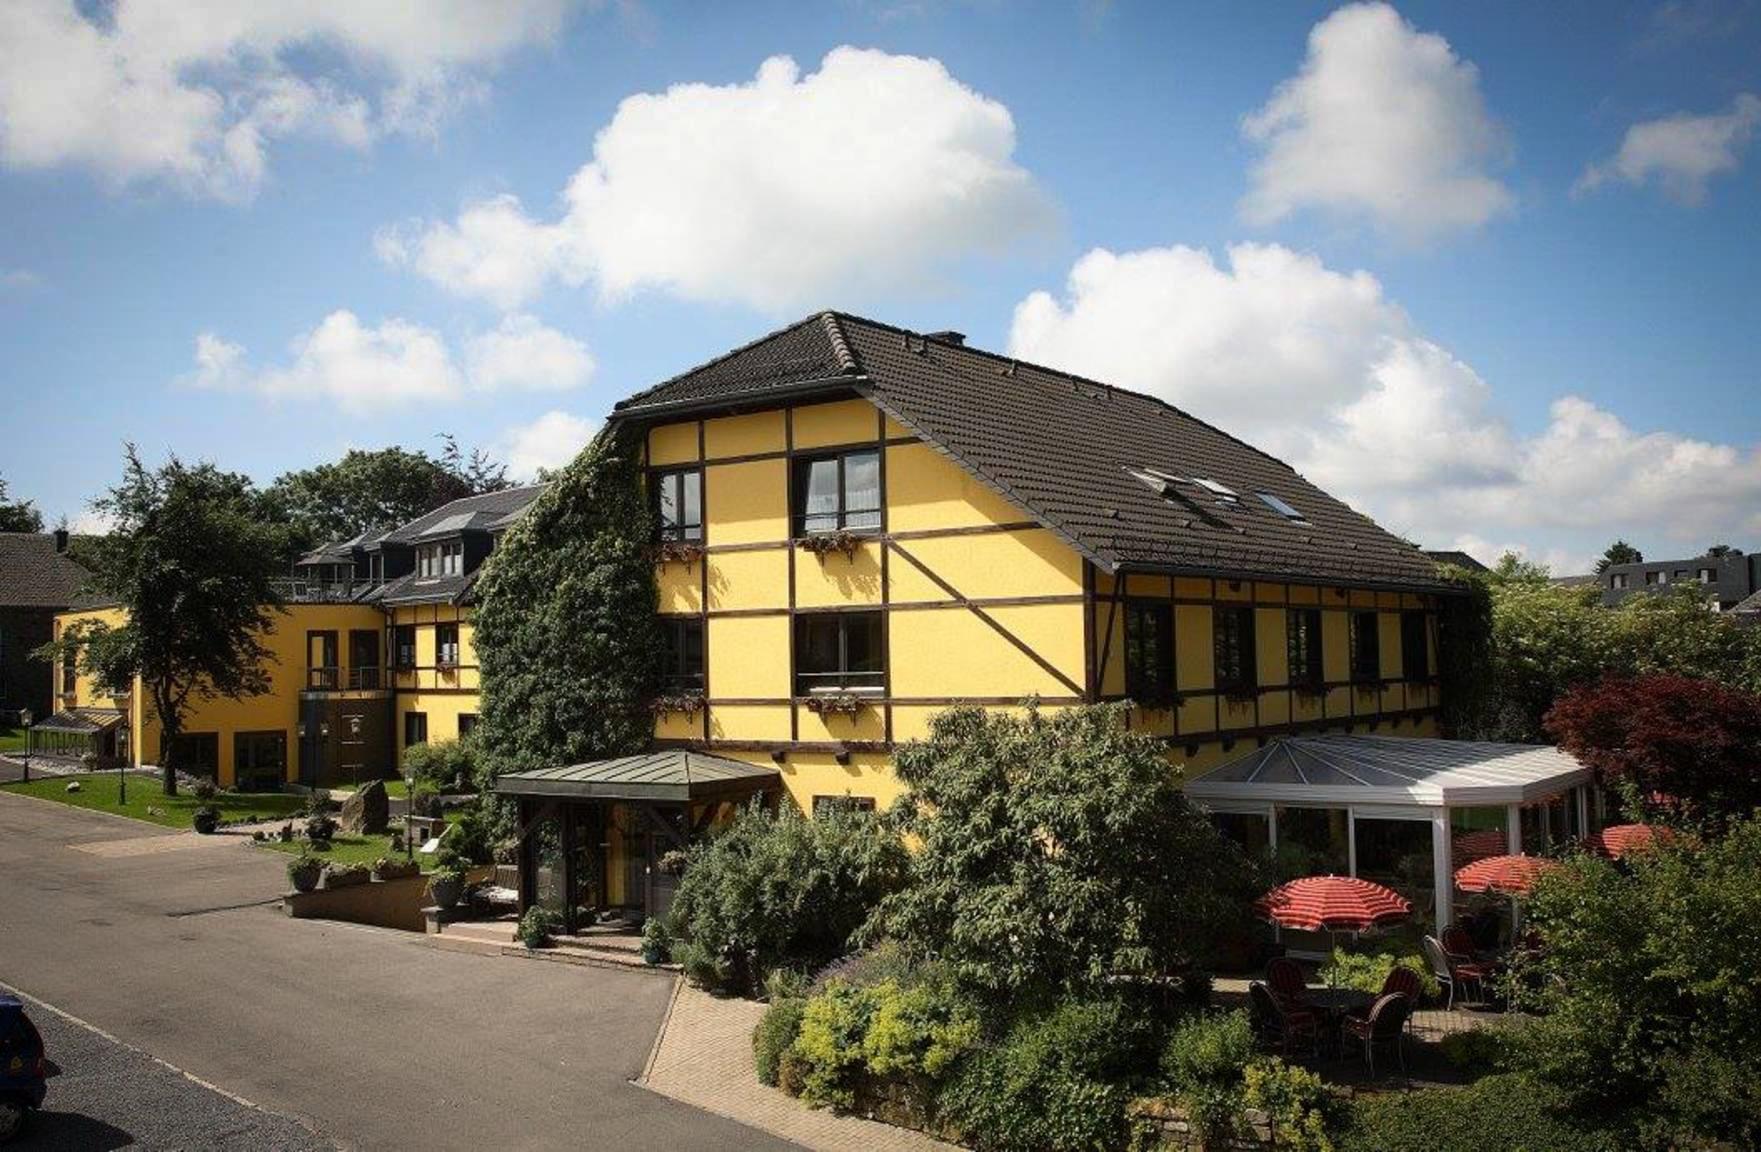 The typical exterior of Bürgenbacher Hof